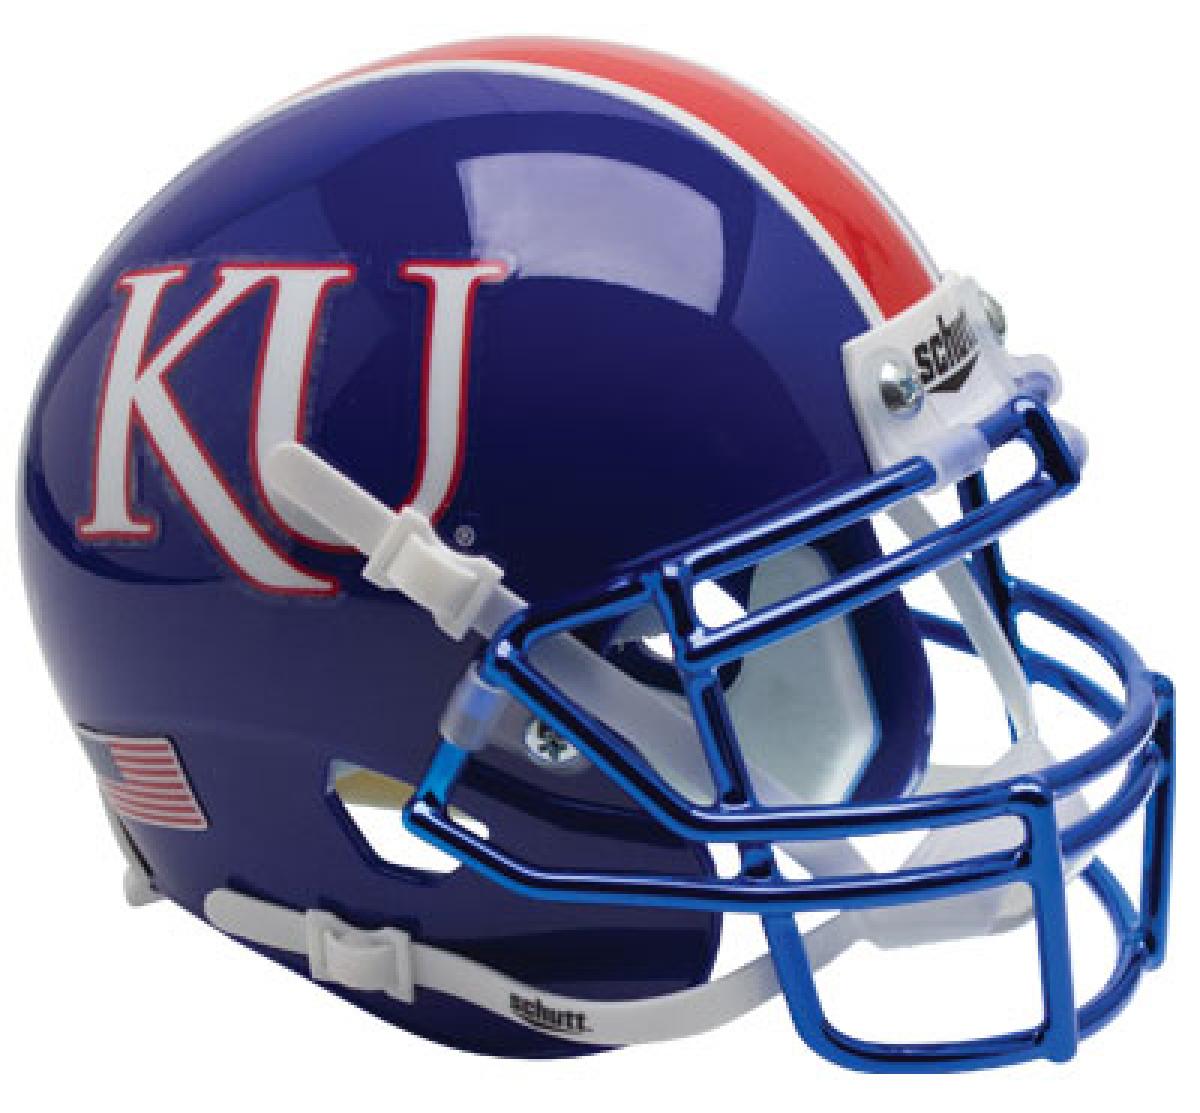 Kansas Jayhawks Full XP Replica Football Helmet Schutt <B>Blue with Chrome Mask</B>